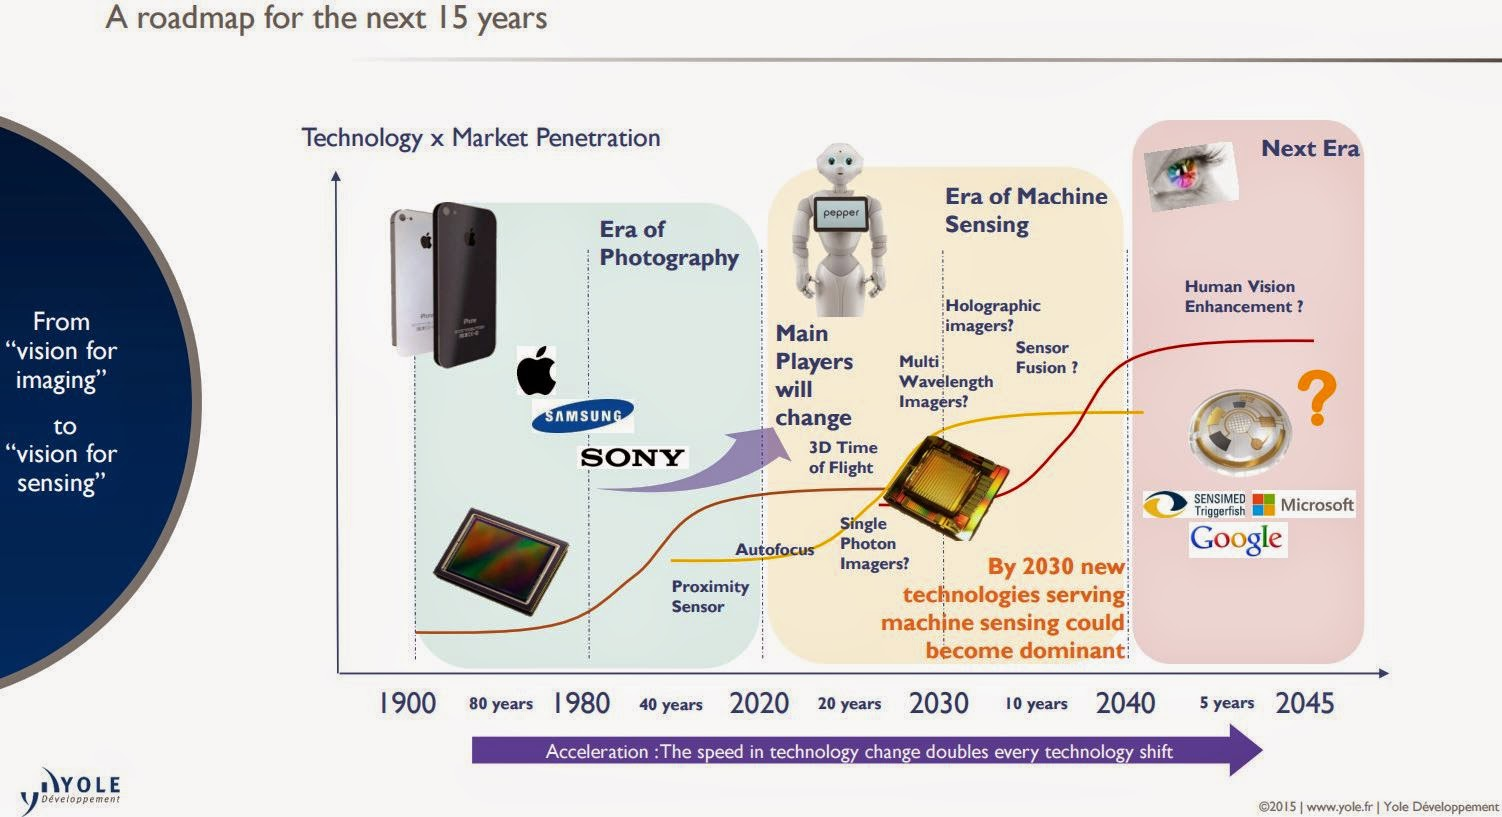 image sensors world yole on image sensor future